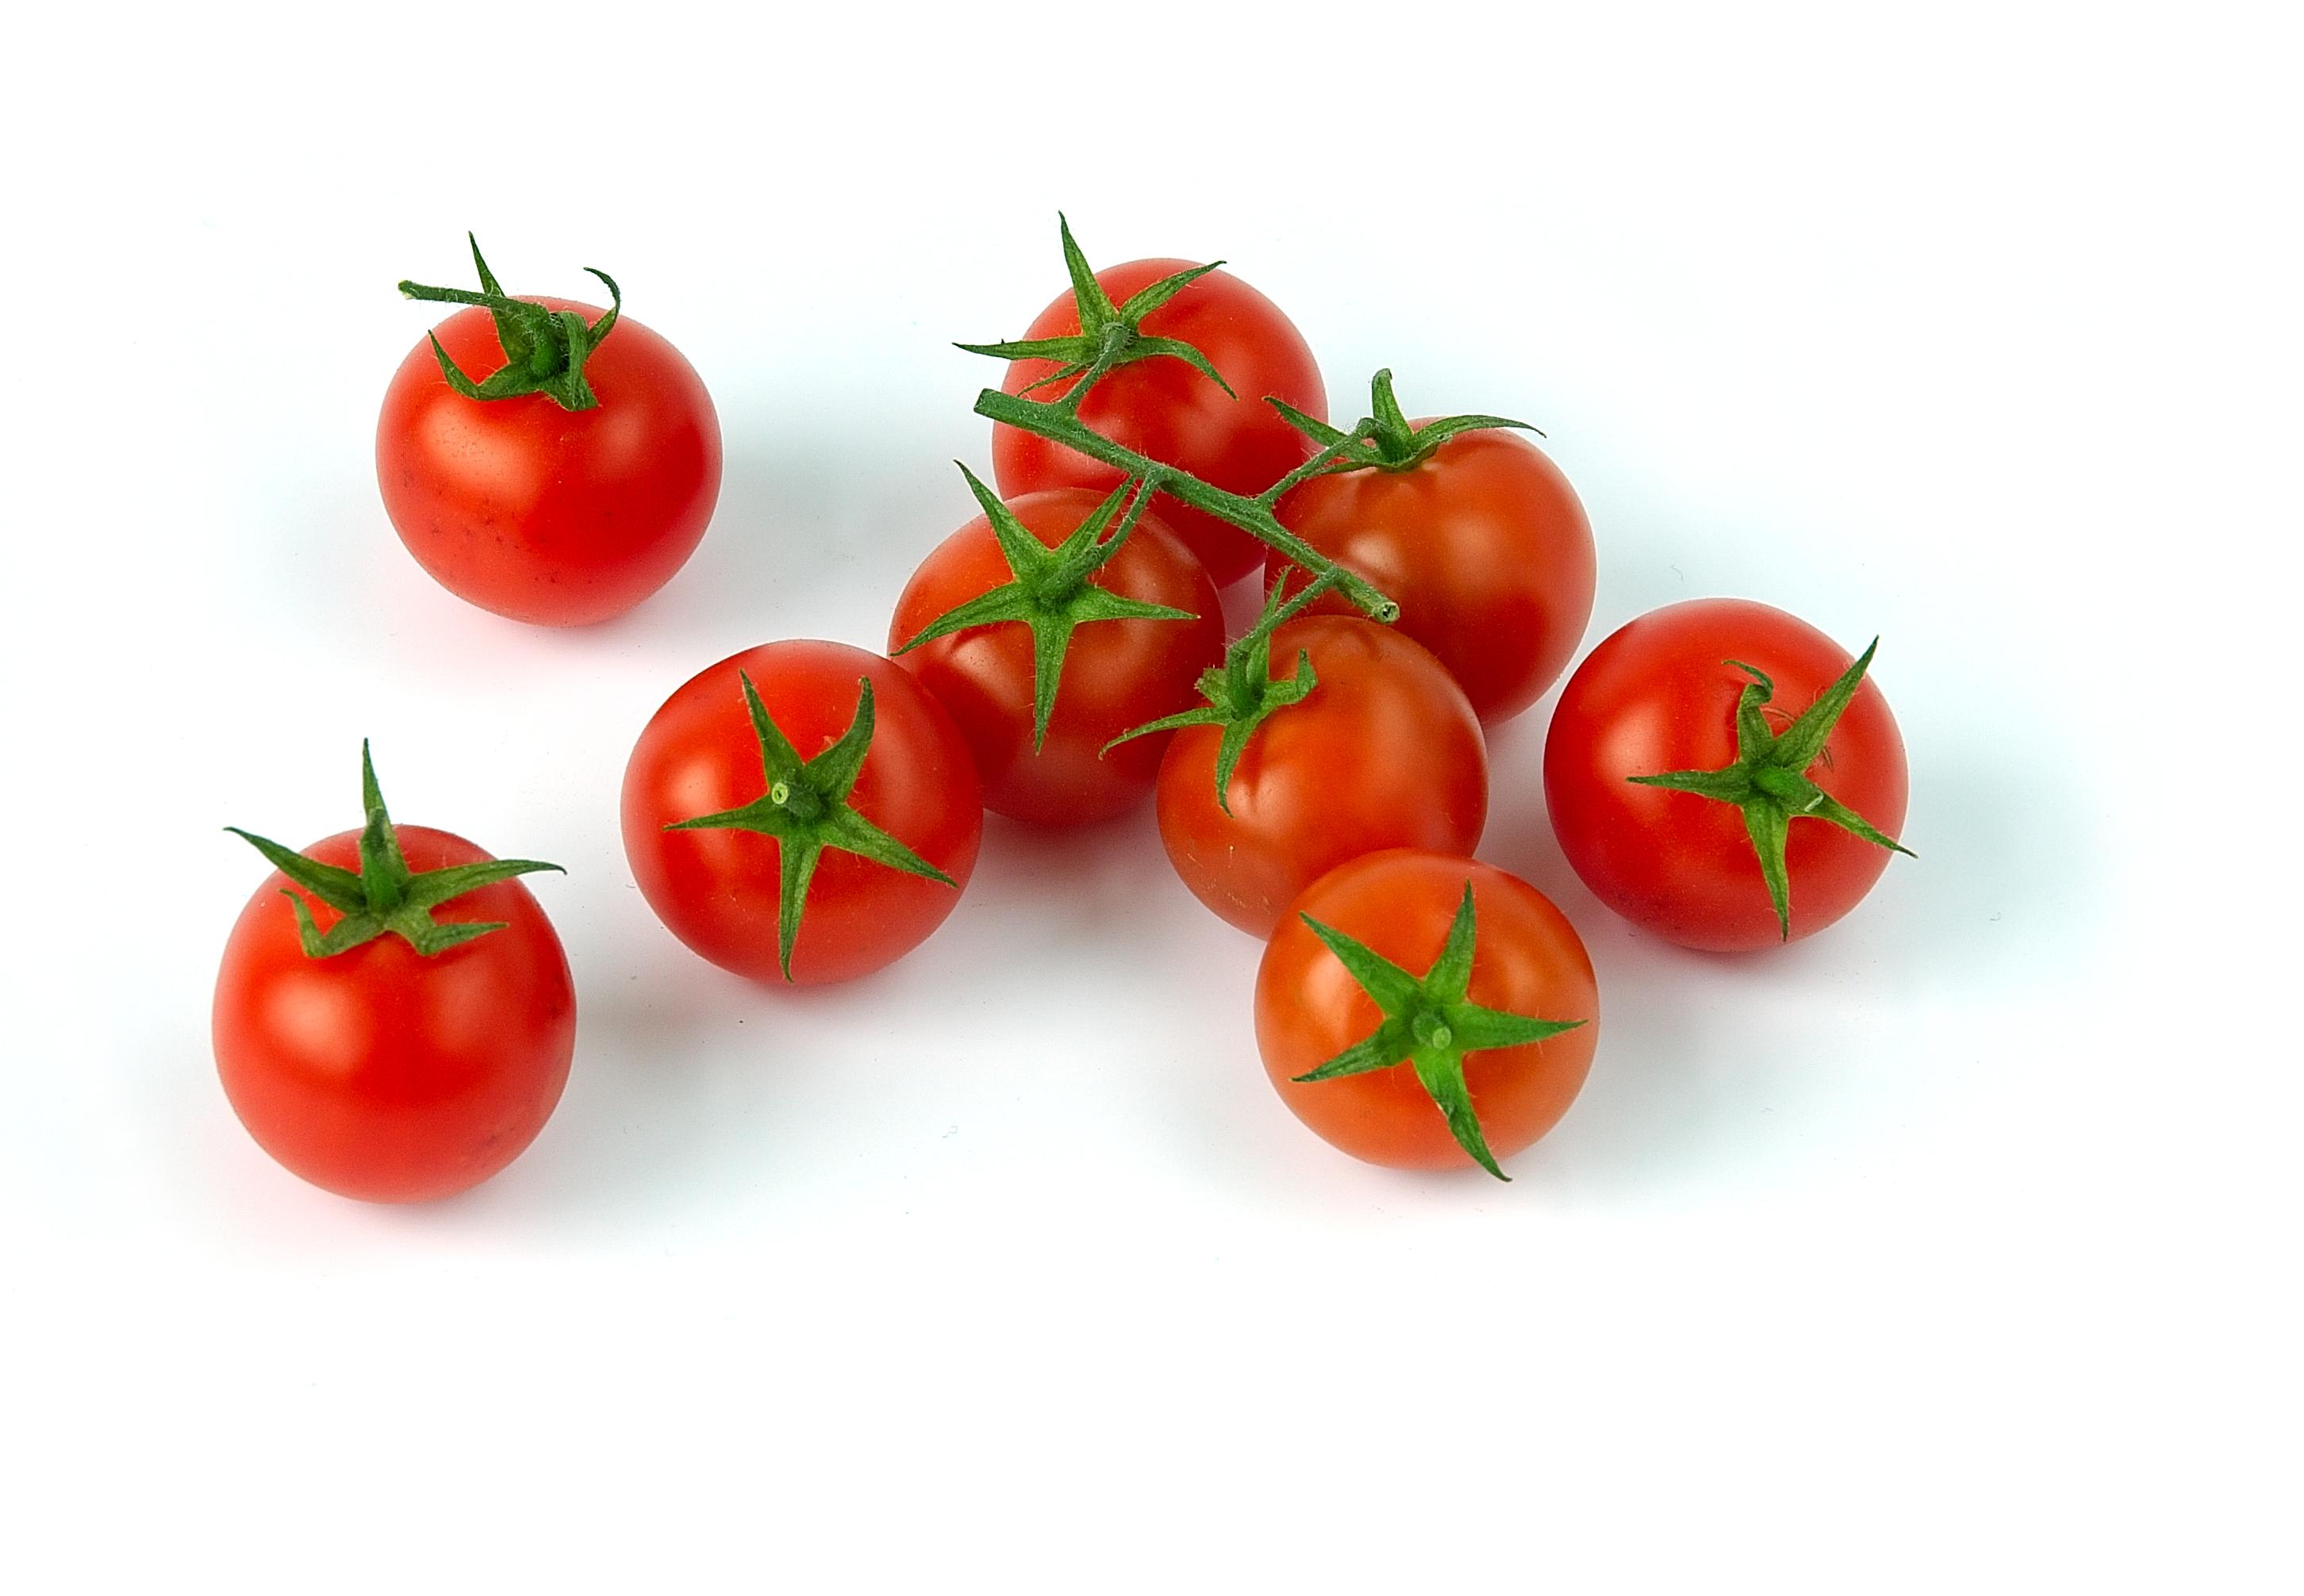 file tomates cerises luc wikipedia. Black Bedroom Furniture Sets. Home Design Ideas